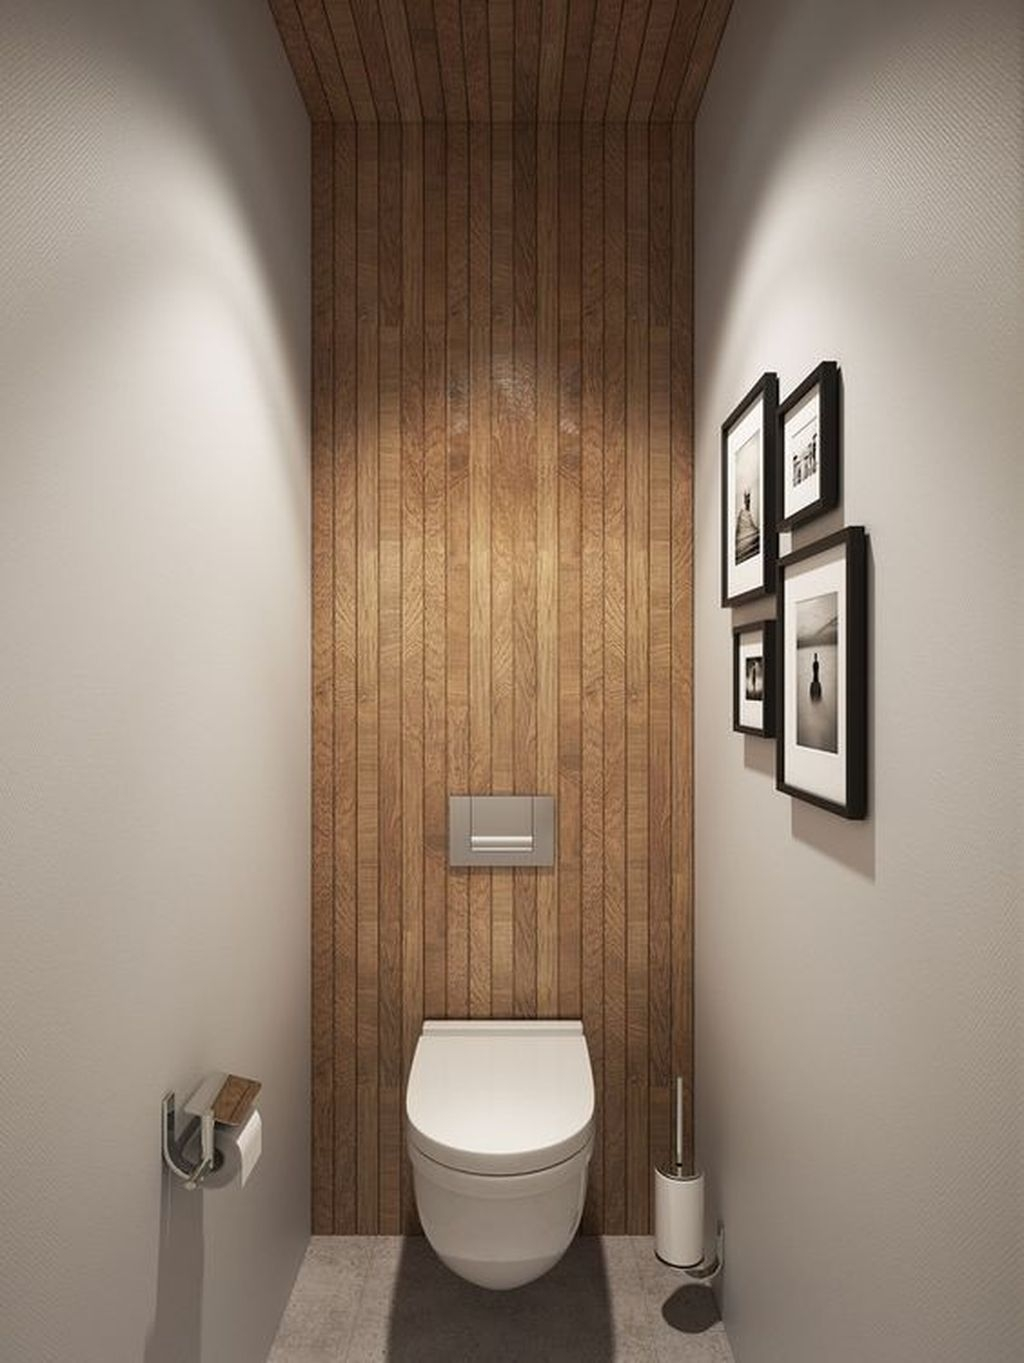 39 Cool And Stylish Small Bathroom Design Ideas26